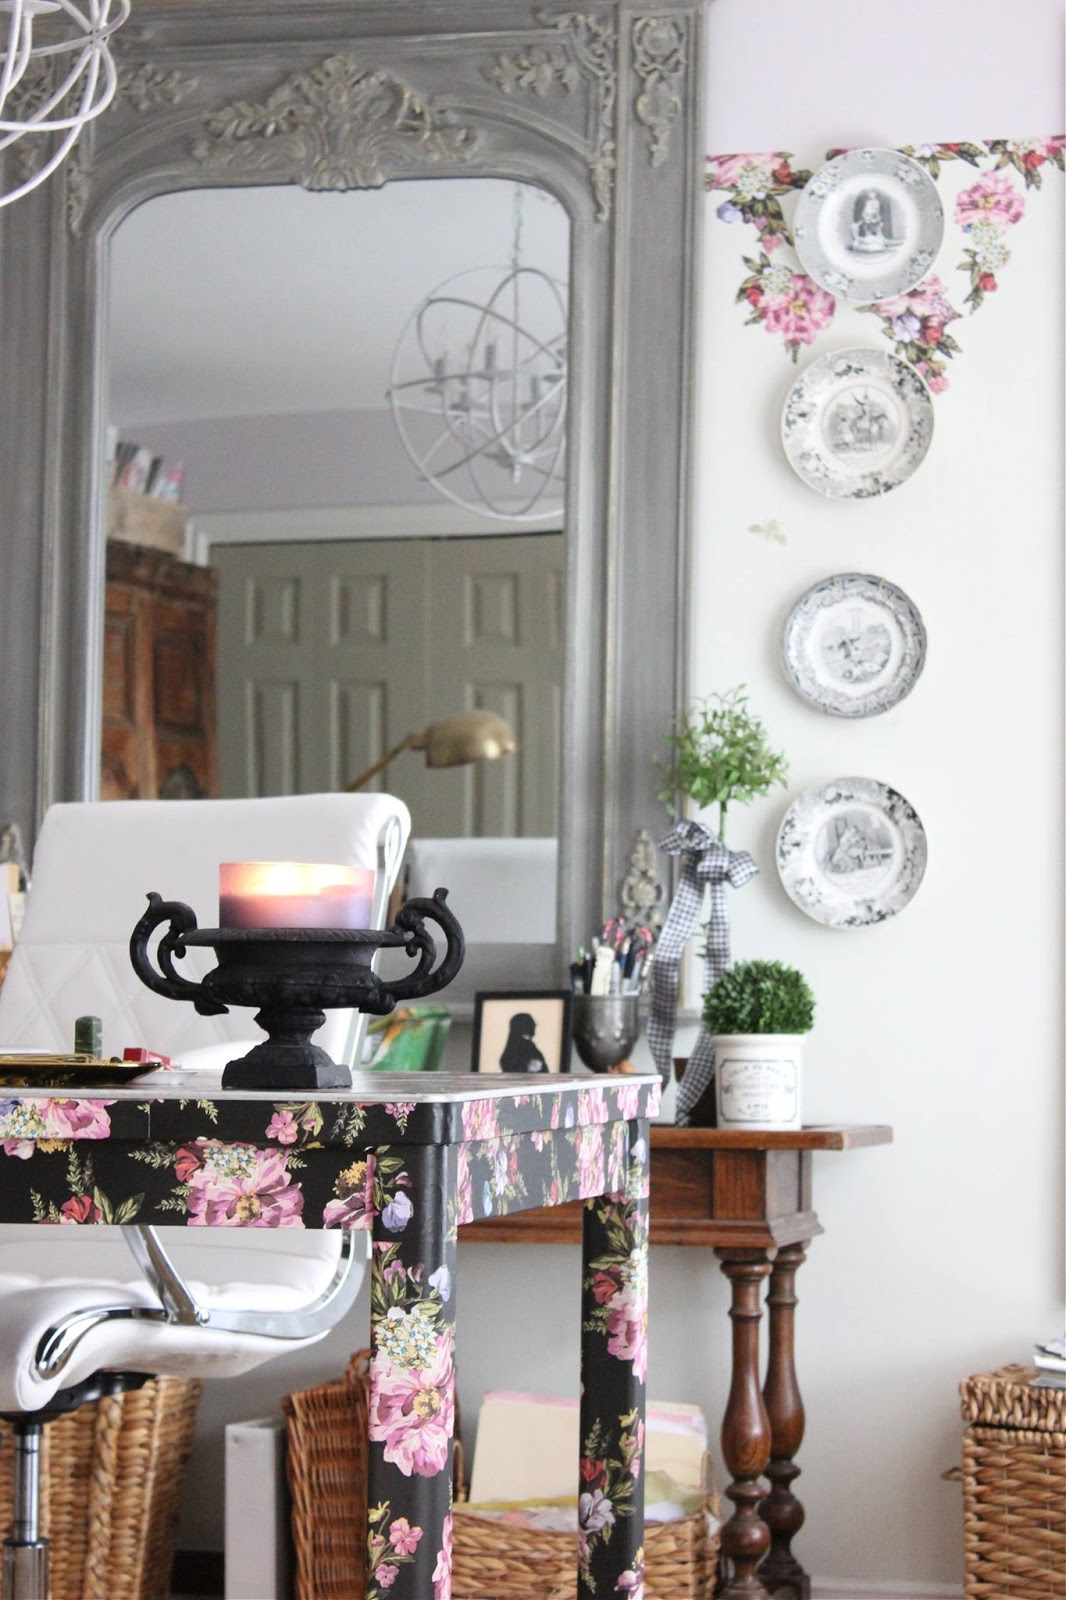 floral decoupage furniture. Floral Decoupage Furniture. Monday, March 21, 2016 Furniture L